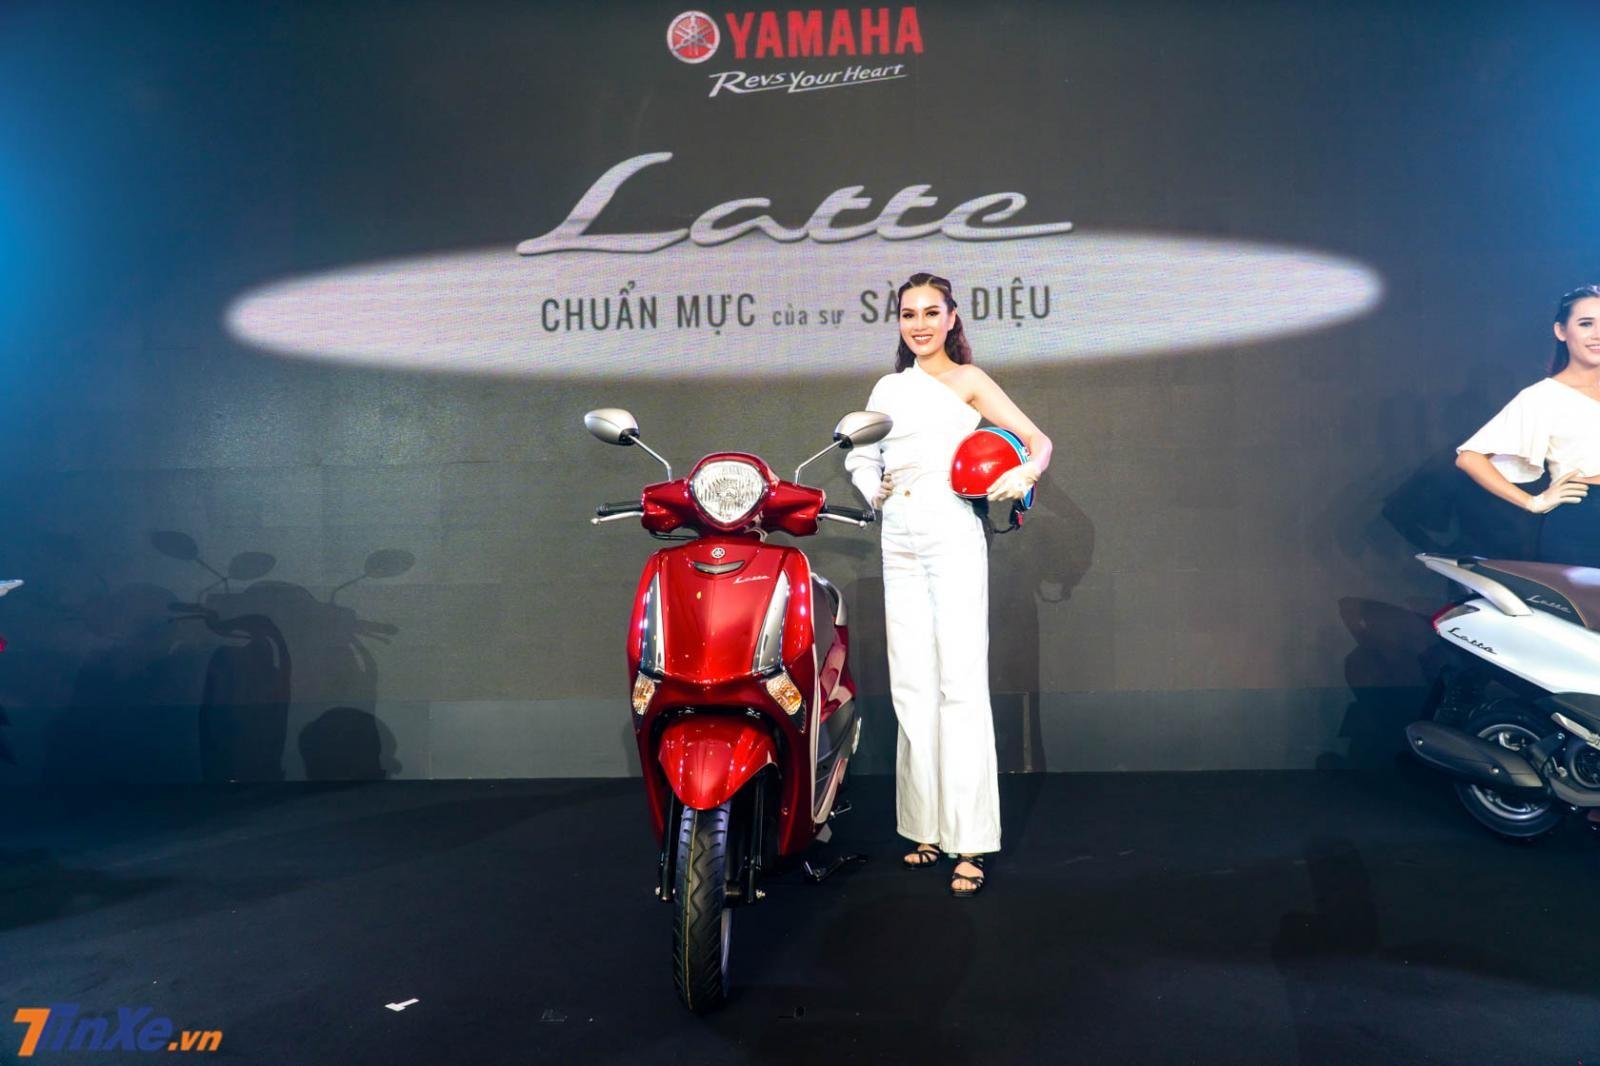 Đánh giá nhanh Yamaha Latte 125